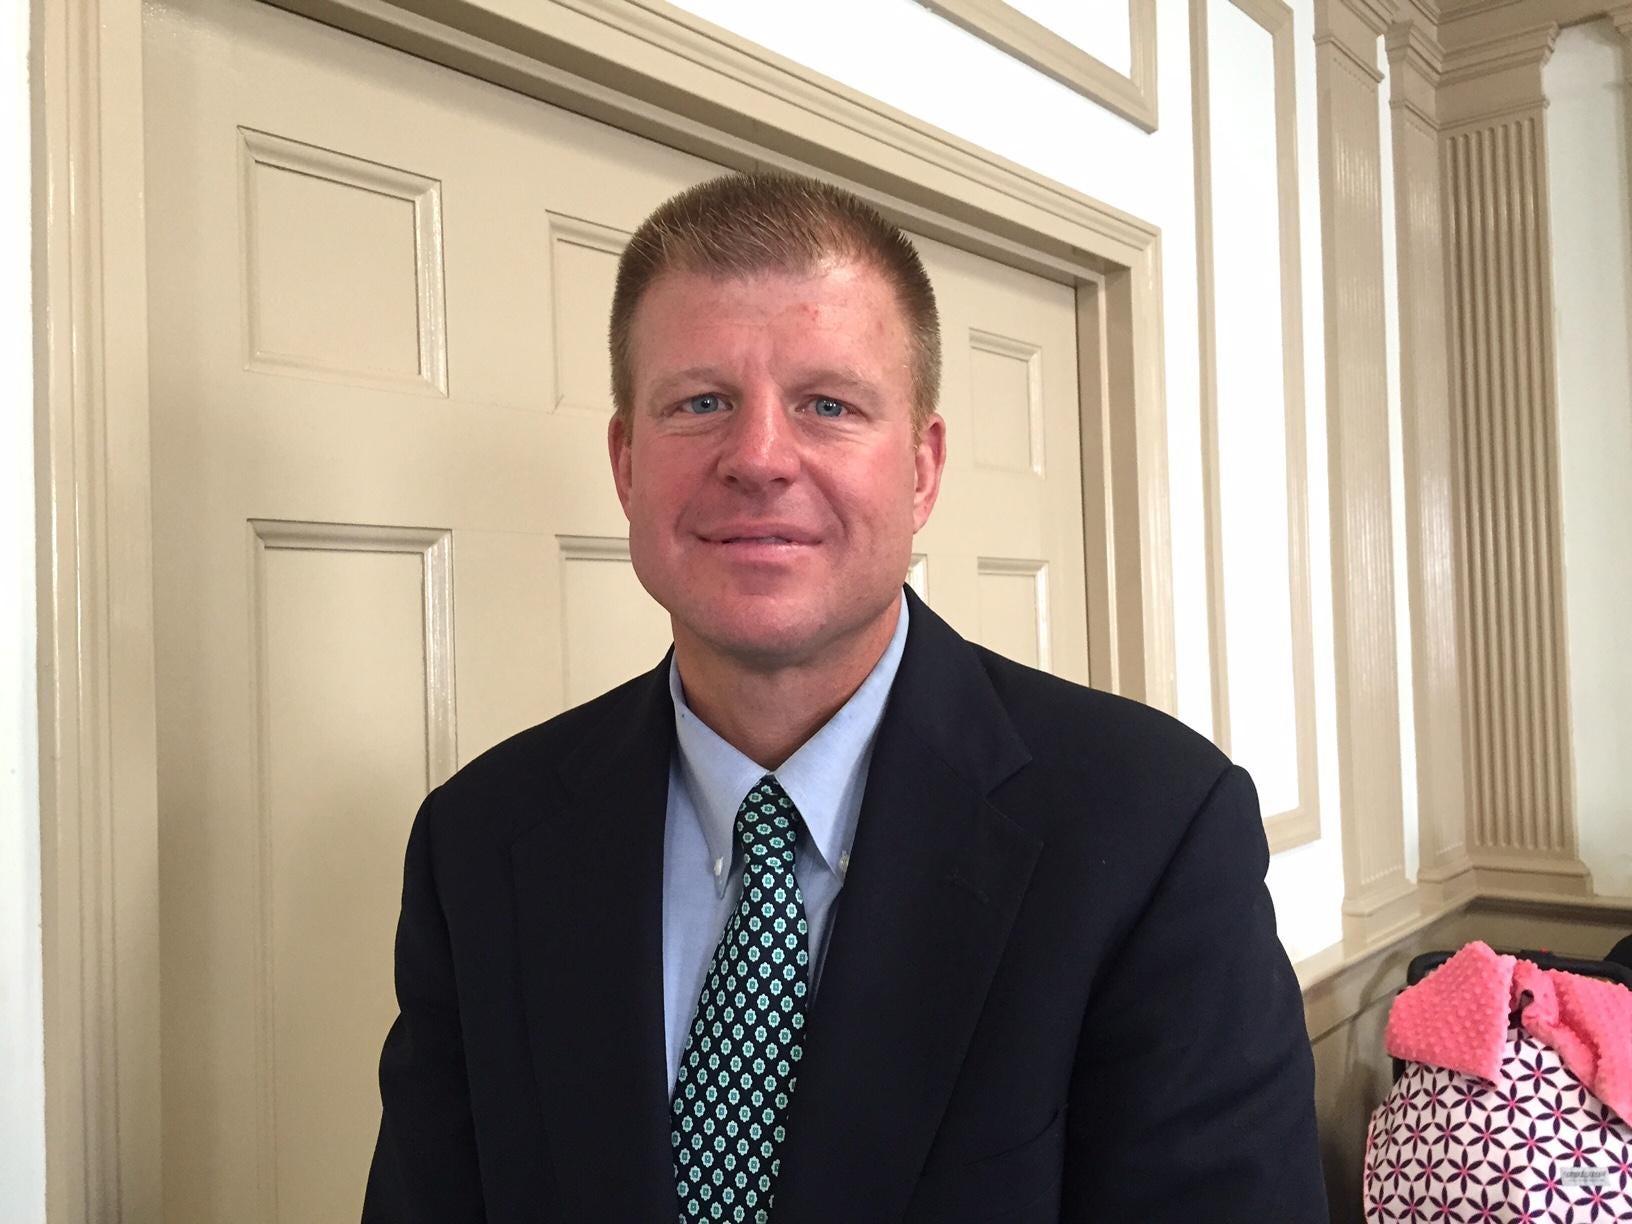 West Morris Central High School Athletic Director Kent W. Schilling.